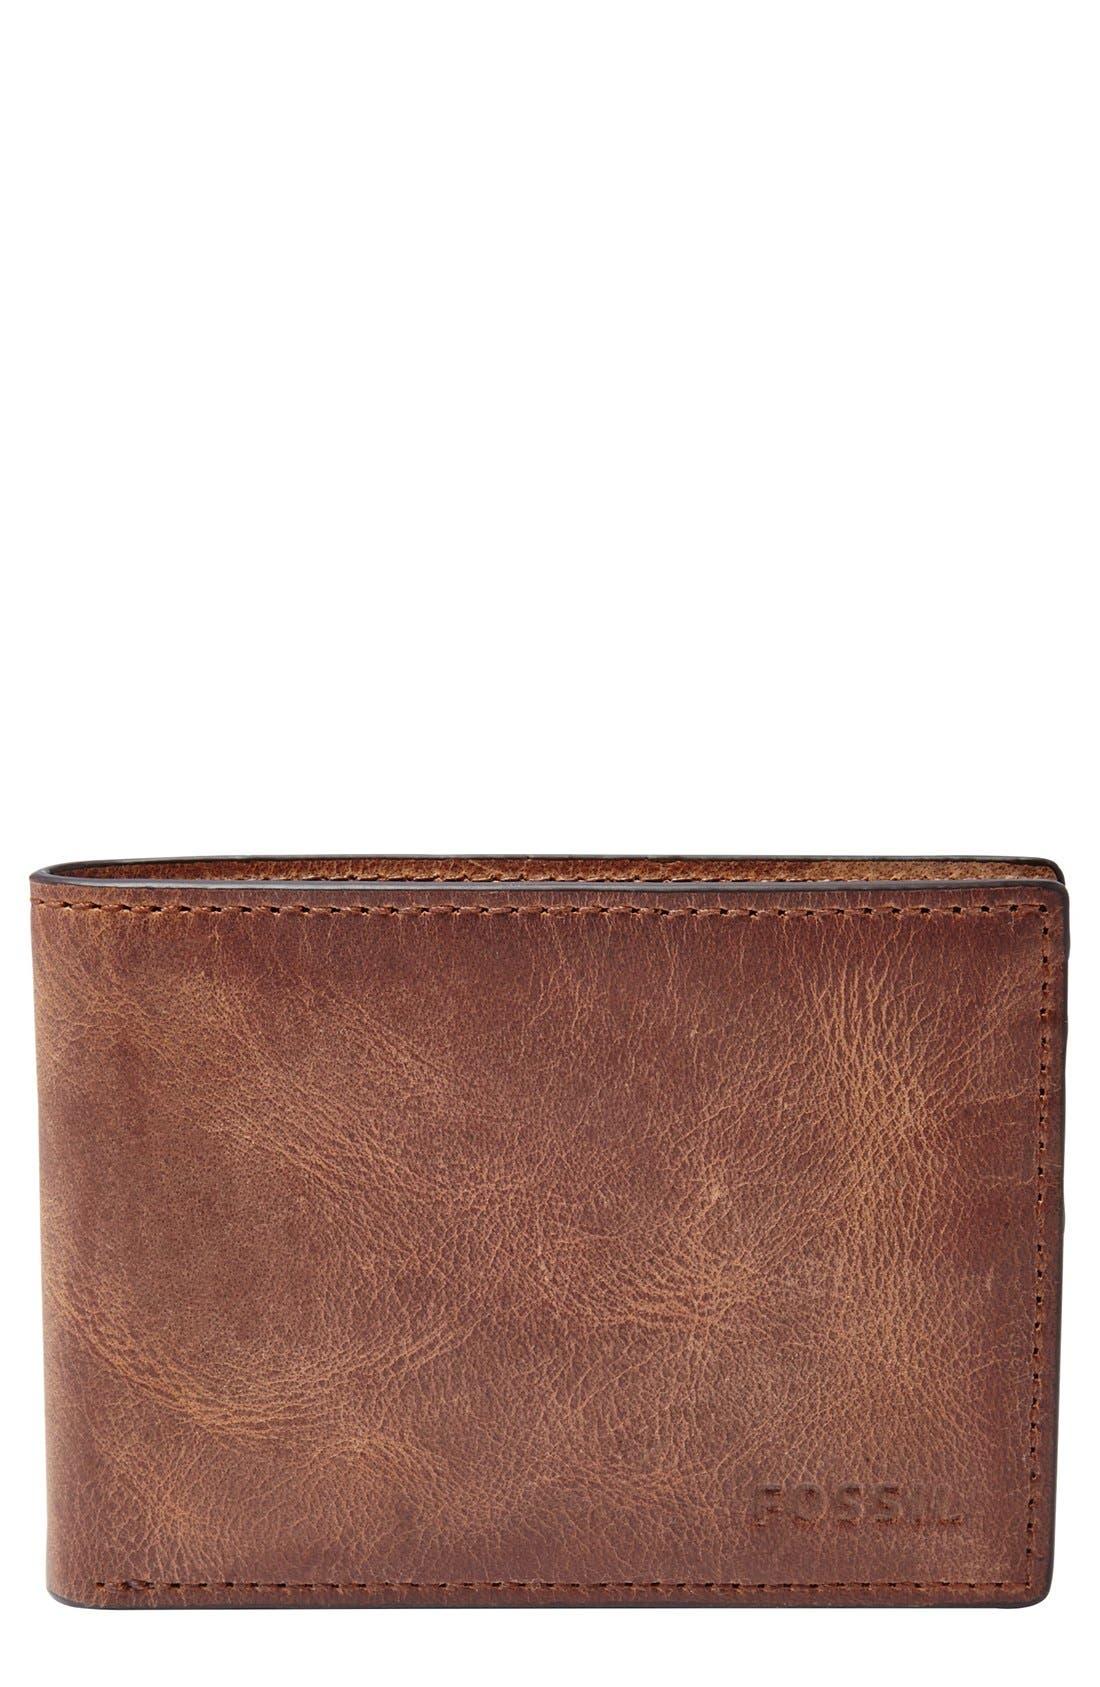 'Derrick' Leather Front Pocket Bifold Wallet,                         Main,                         color, Brown